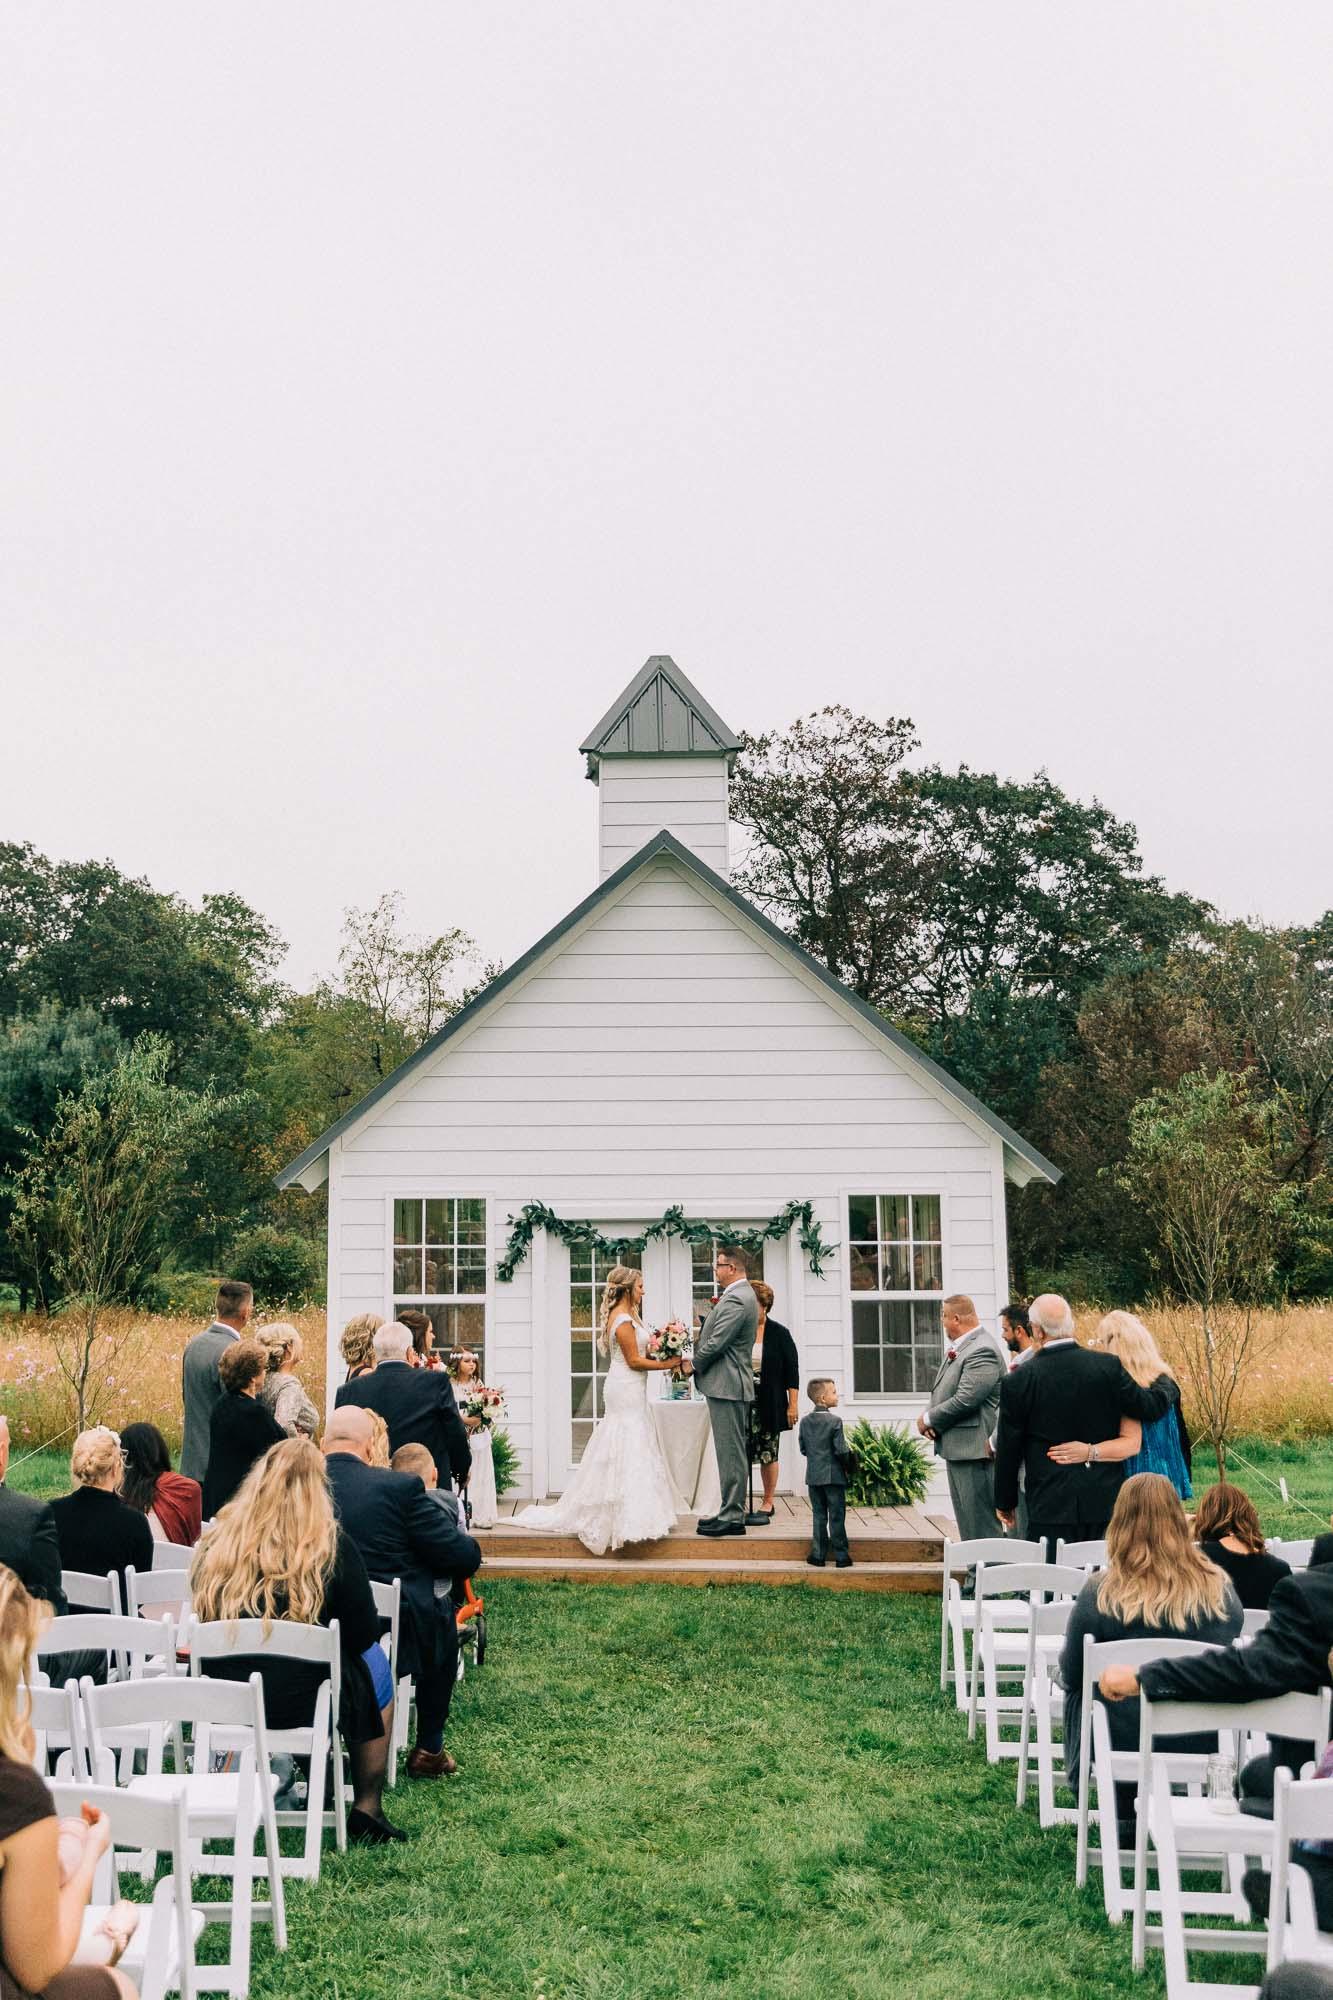 Lodge-at-Raven-Creek-October-wedding-32.jpg